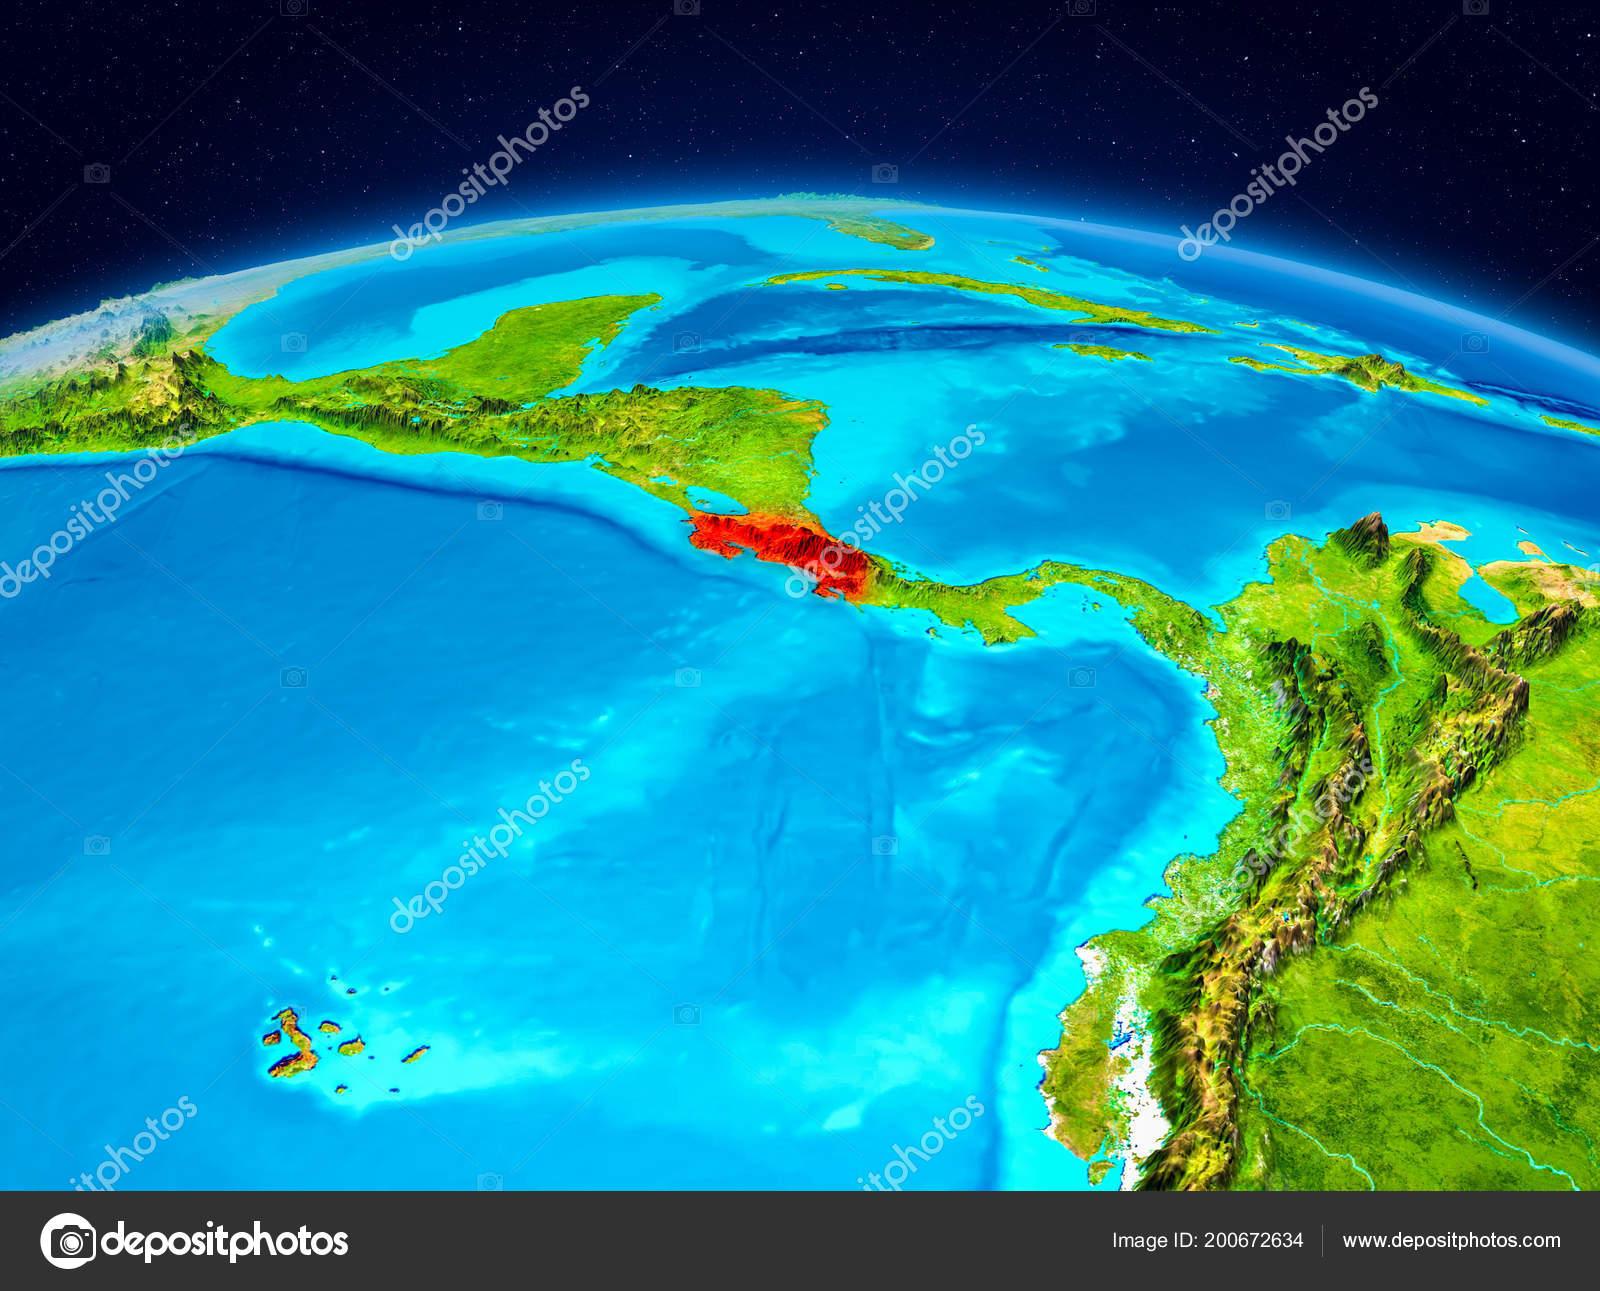 Satellite View Costa Rica Highlighted Red Planet Earth ... on iran satellite, central america satellite, vietnam satellite, caribbean satellite, american samoa satellite, tahiti satellite, cuba satellite, australia satellite, england satellite, argentina satellite, new zealand satellite, honduras satellite, united states satellite, barbados satellite, papua new guinea satellite, somalia satellite, latin america satellite, north america satellite, florida satellite, sri lanka satellite,